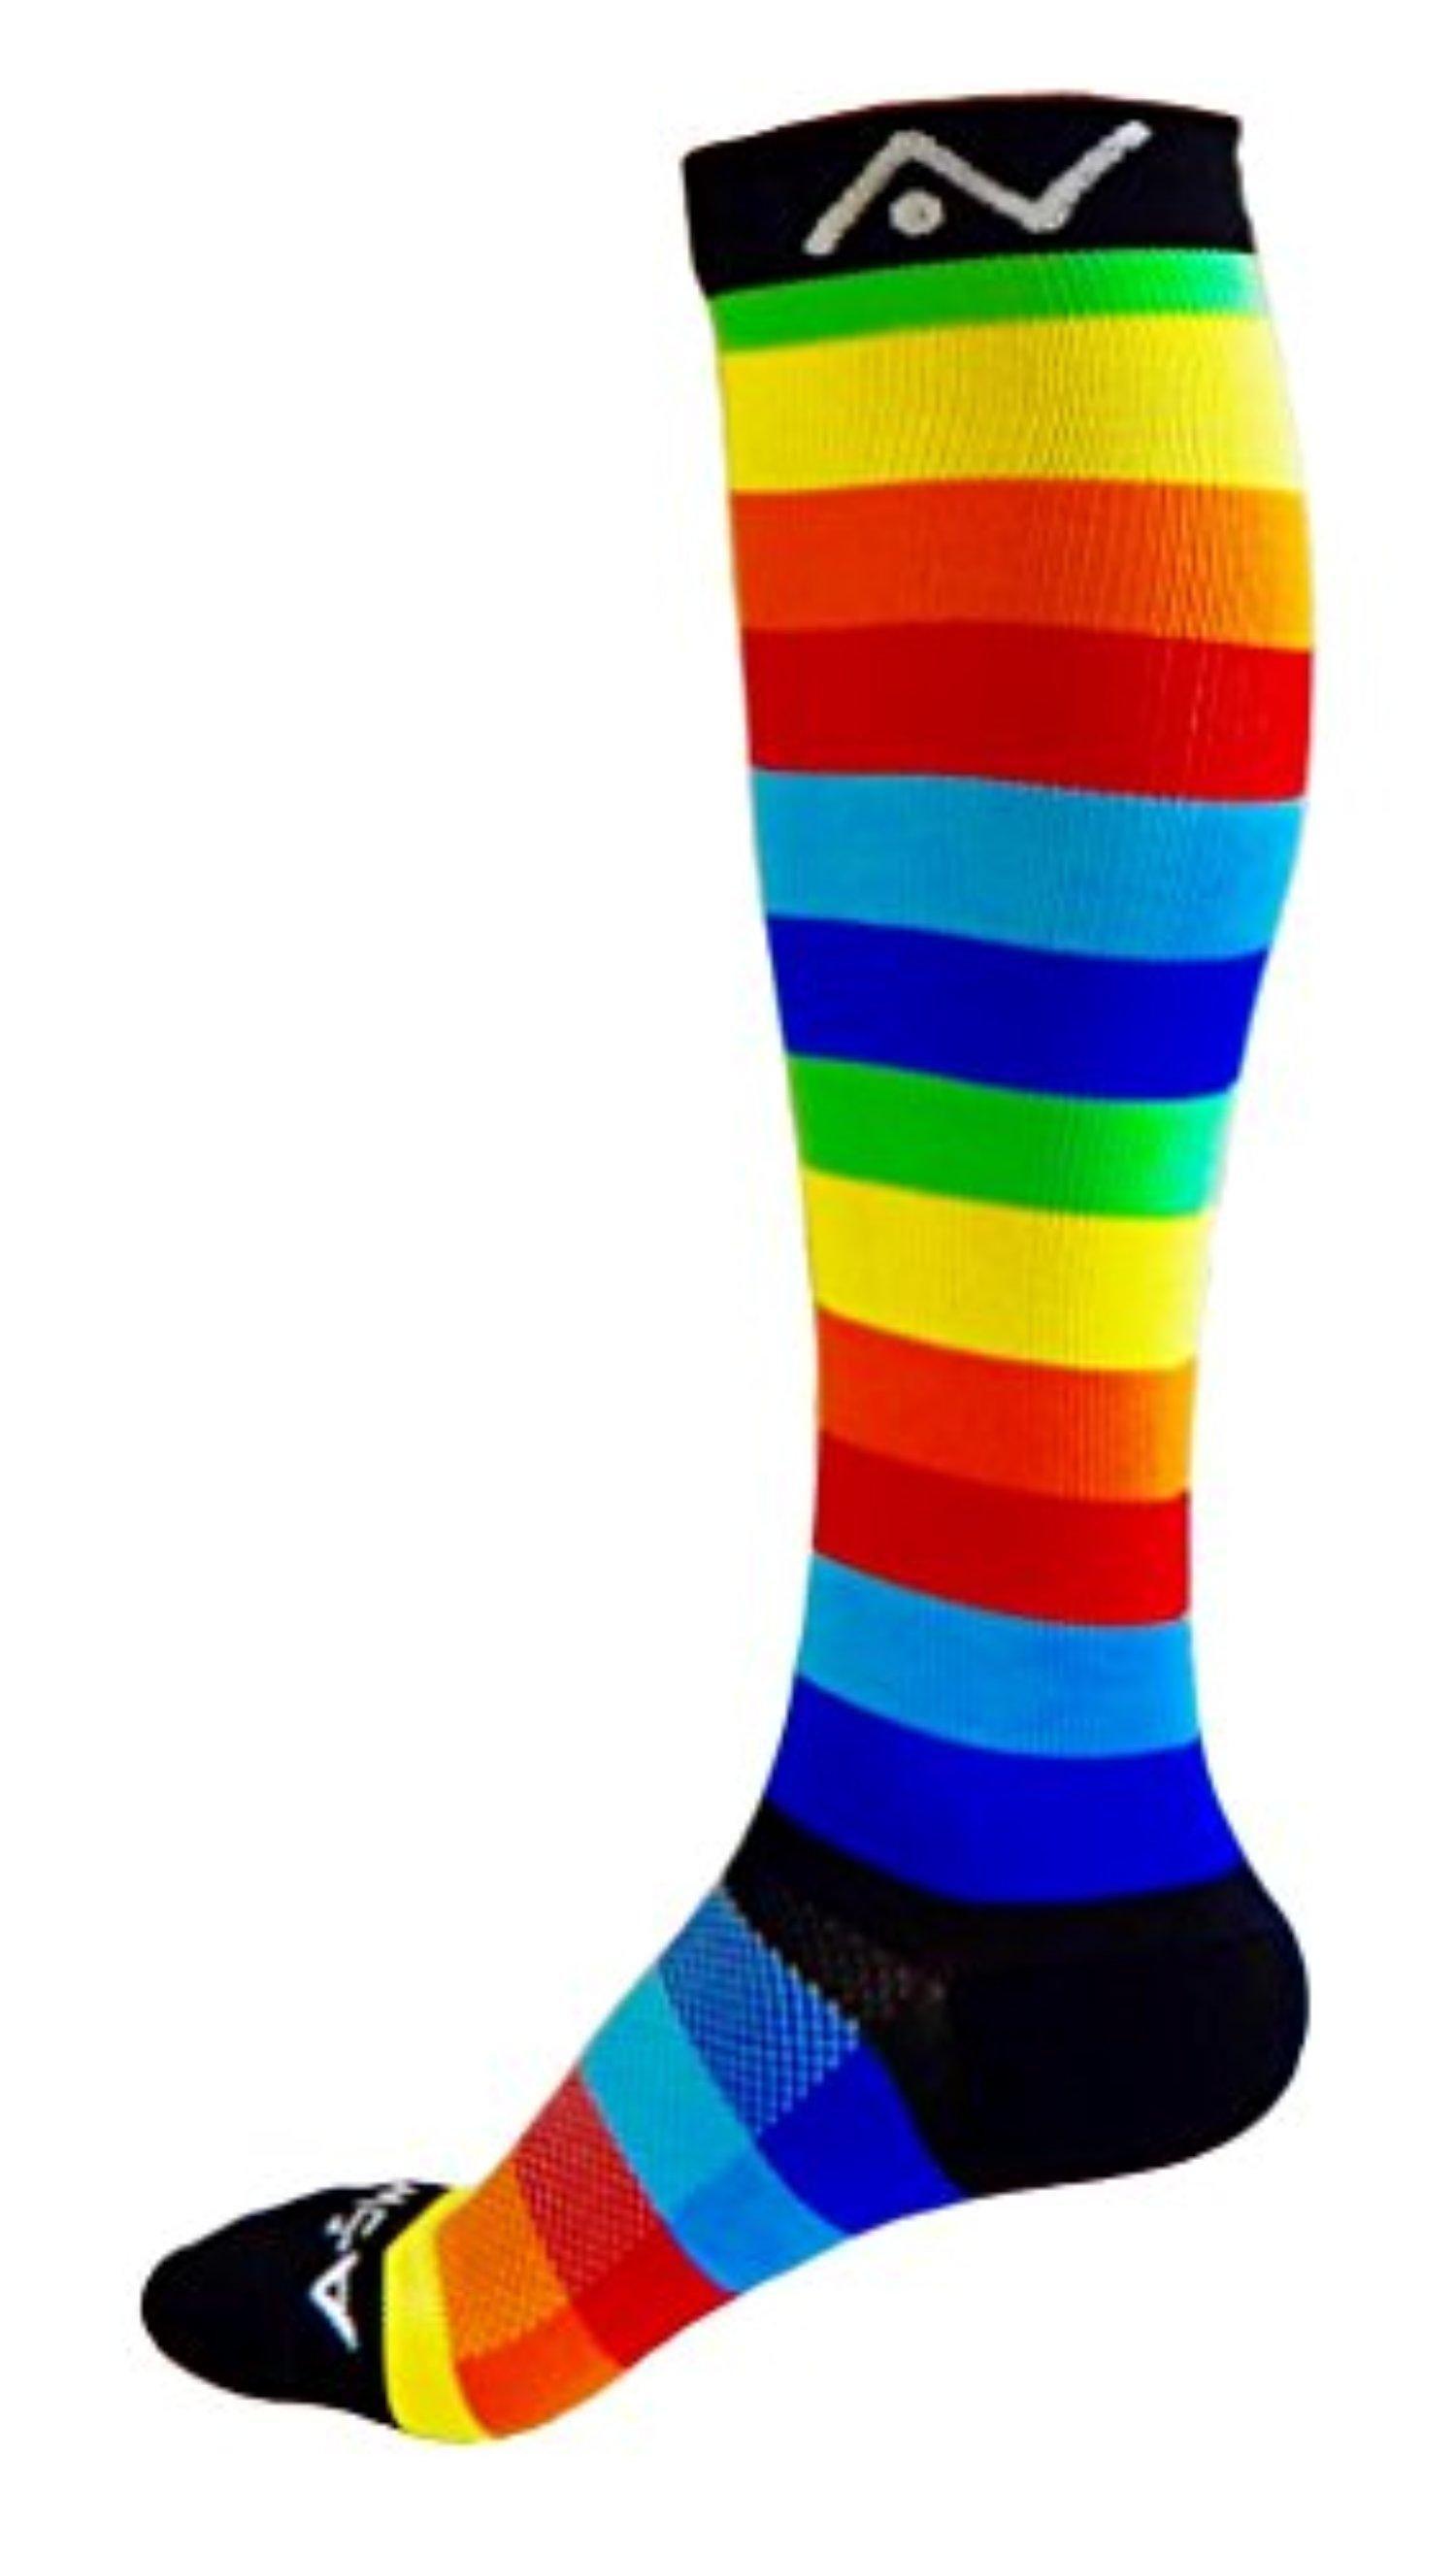 fdefa3593 Fun Pattern Compression Socks for Women and Men - Best Running Sports  Medical Graduated Nursing Socks - Suits Nurses Maternity Pregnancy Shin  Splints ...